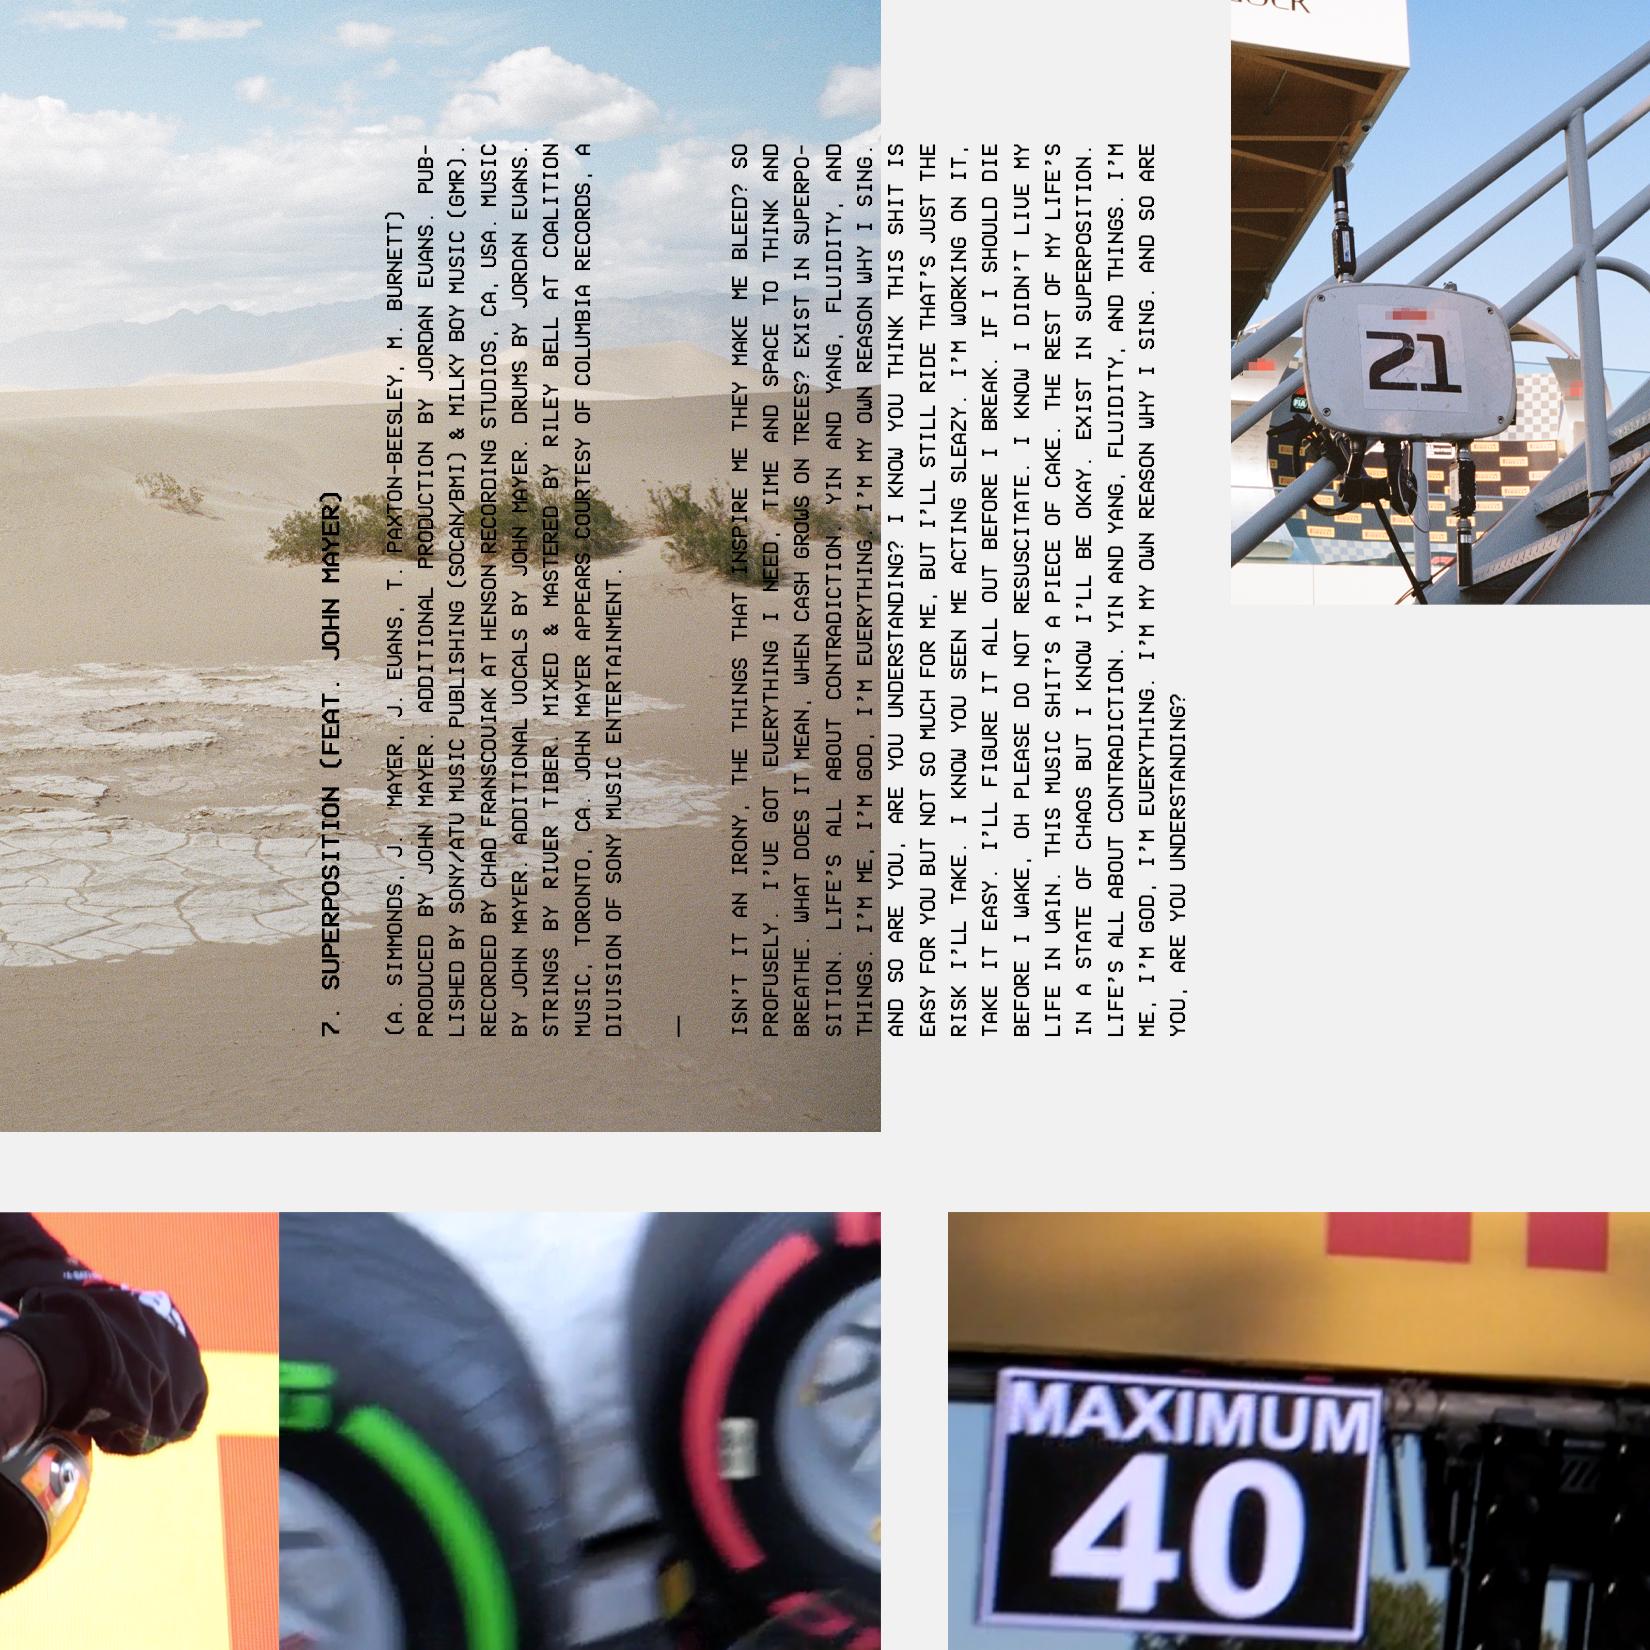 casestudy-linernotes-PG-08.jpg